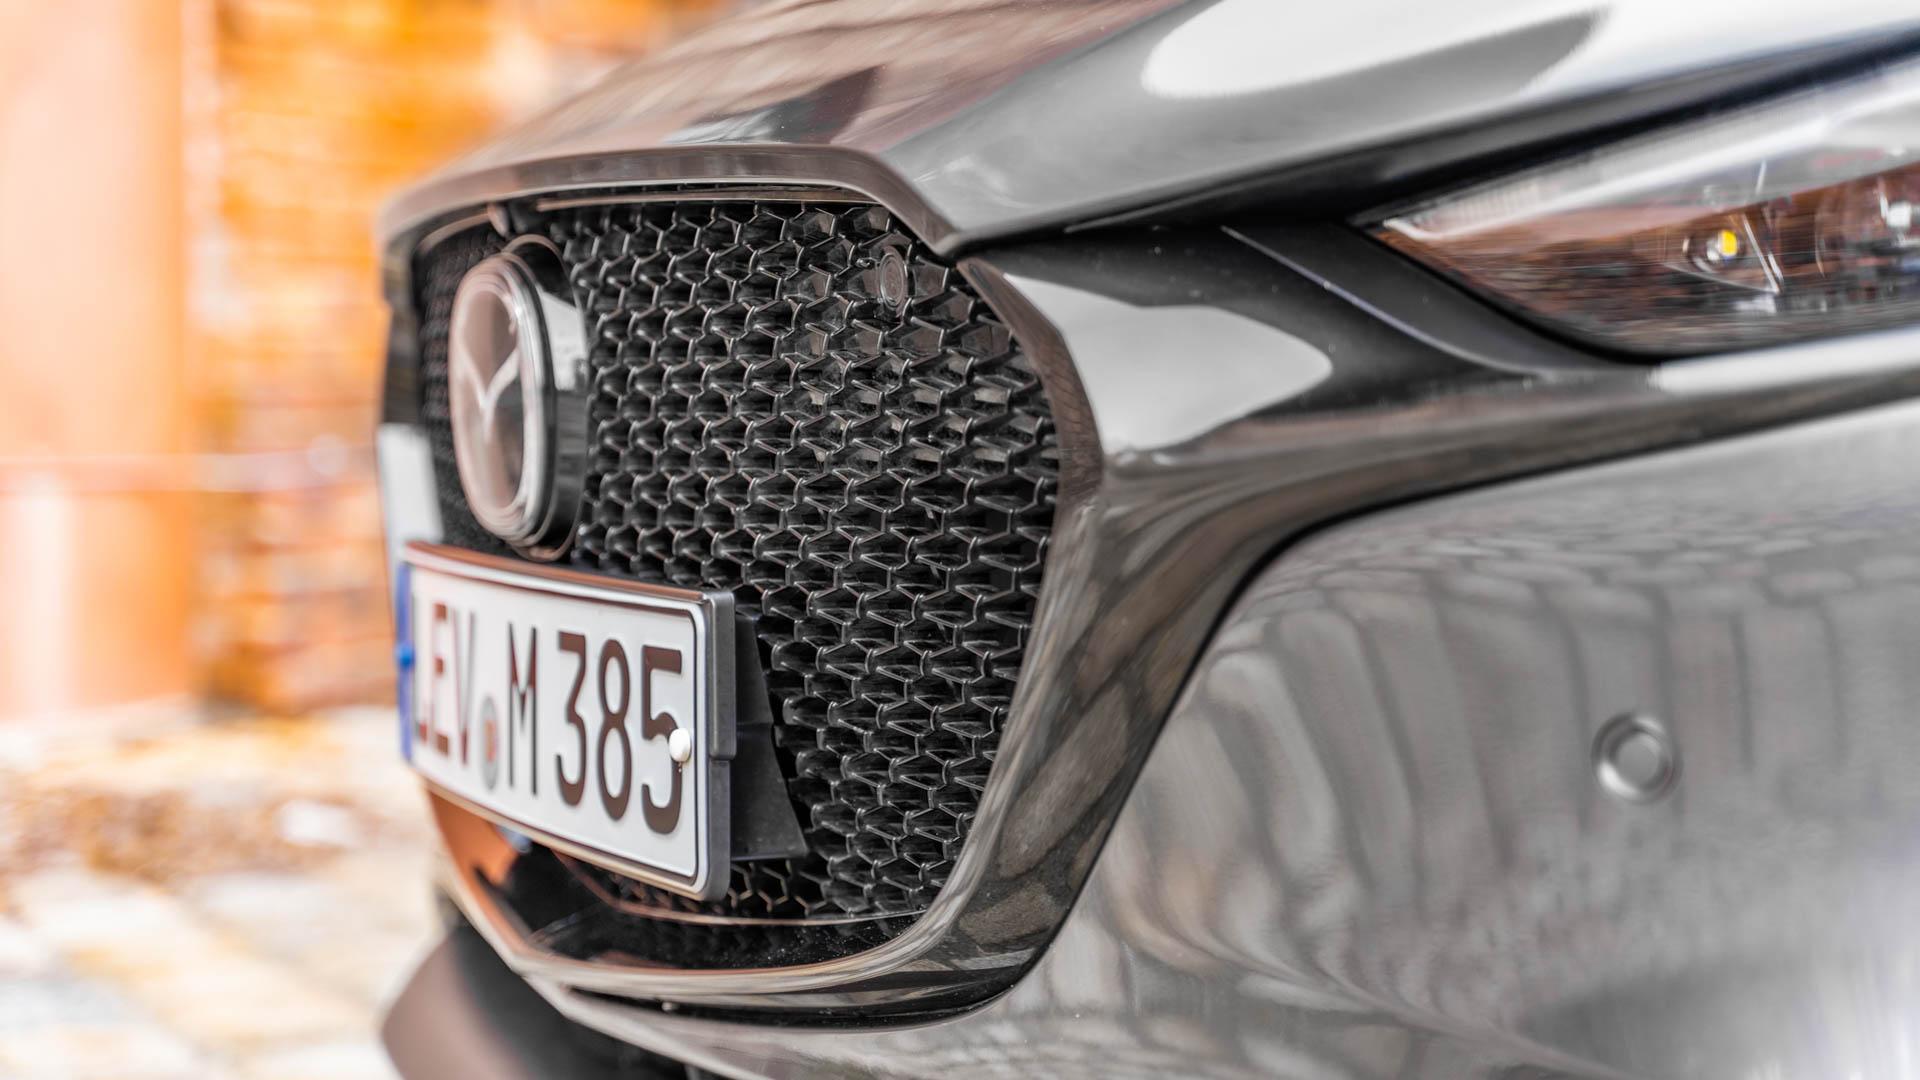 TW_Mazda.jpg